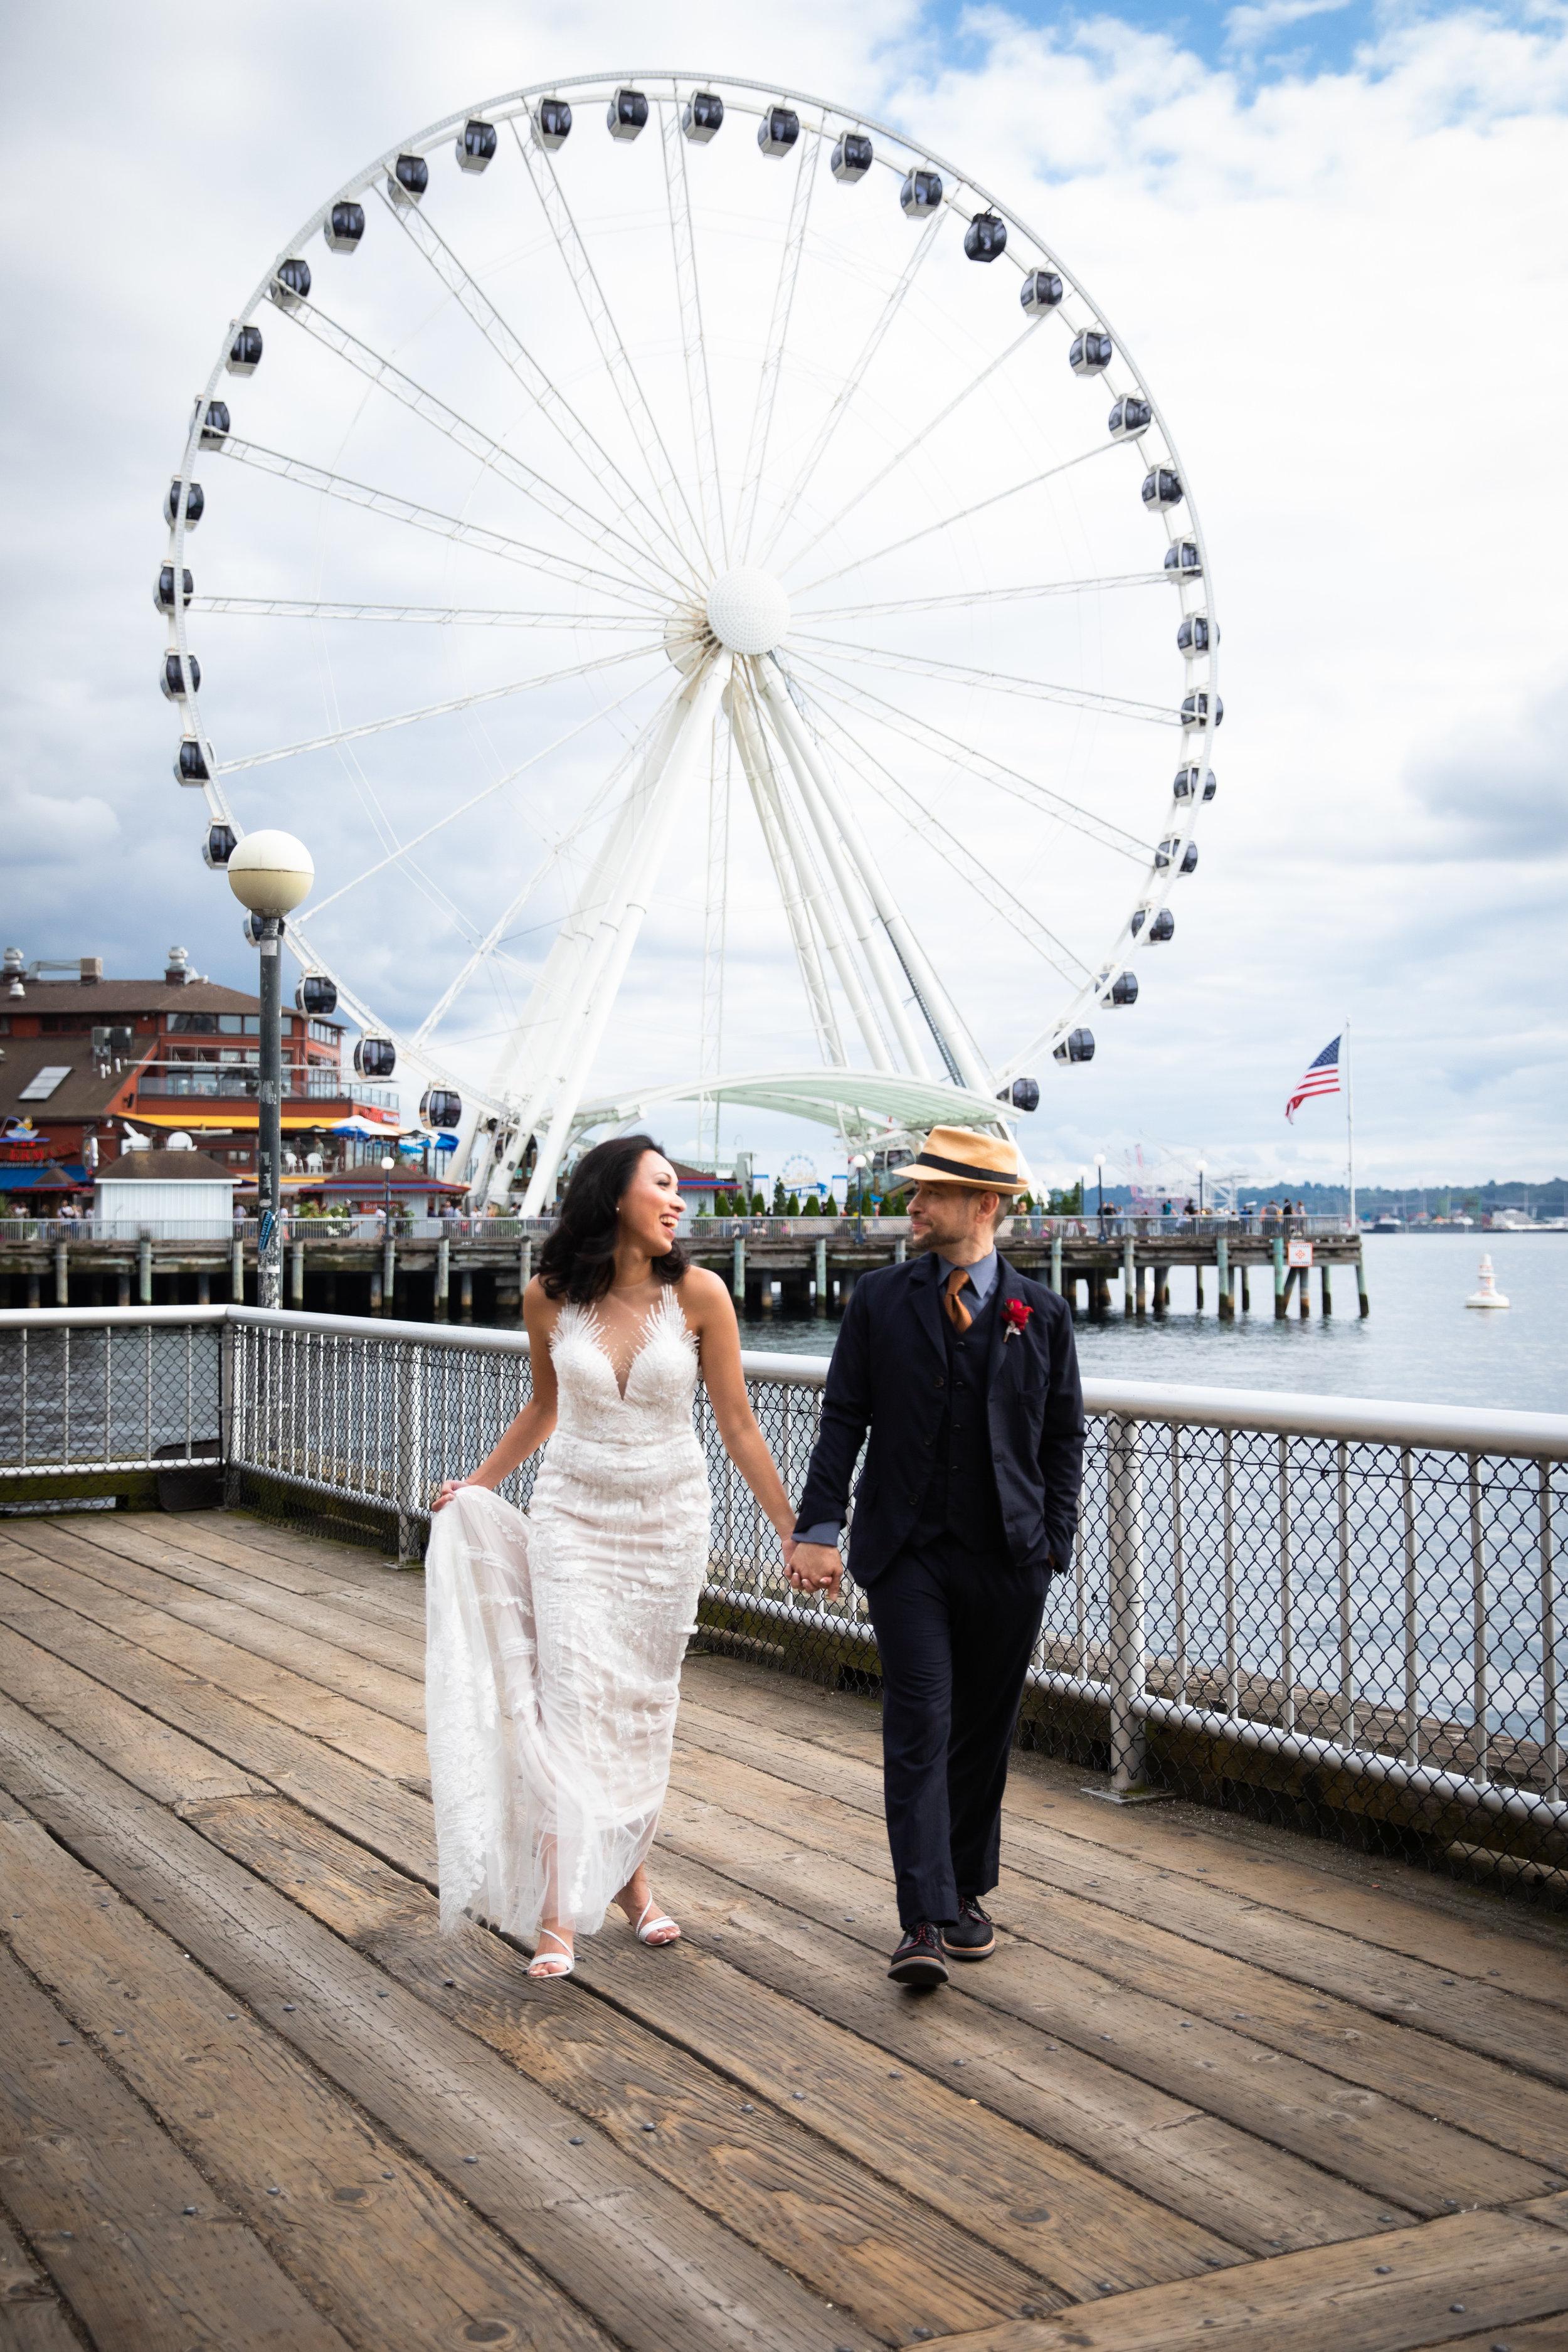 Seattle-Aquarium-Wedding-Preview-3.jpg